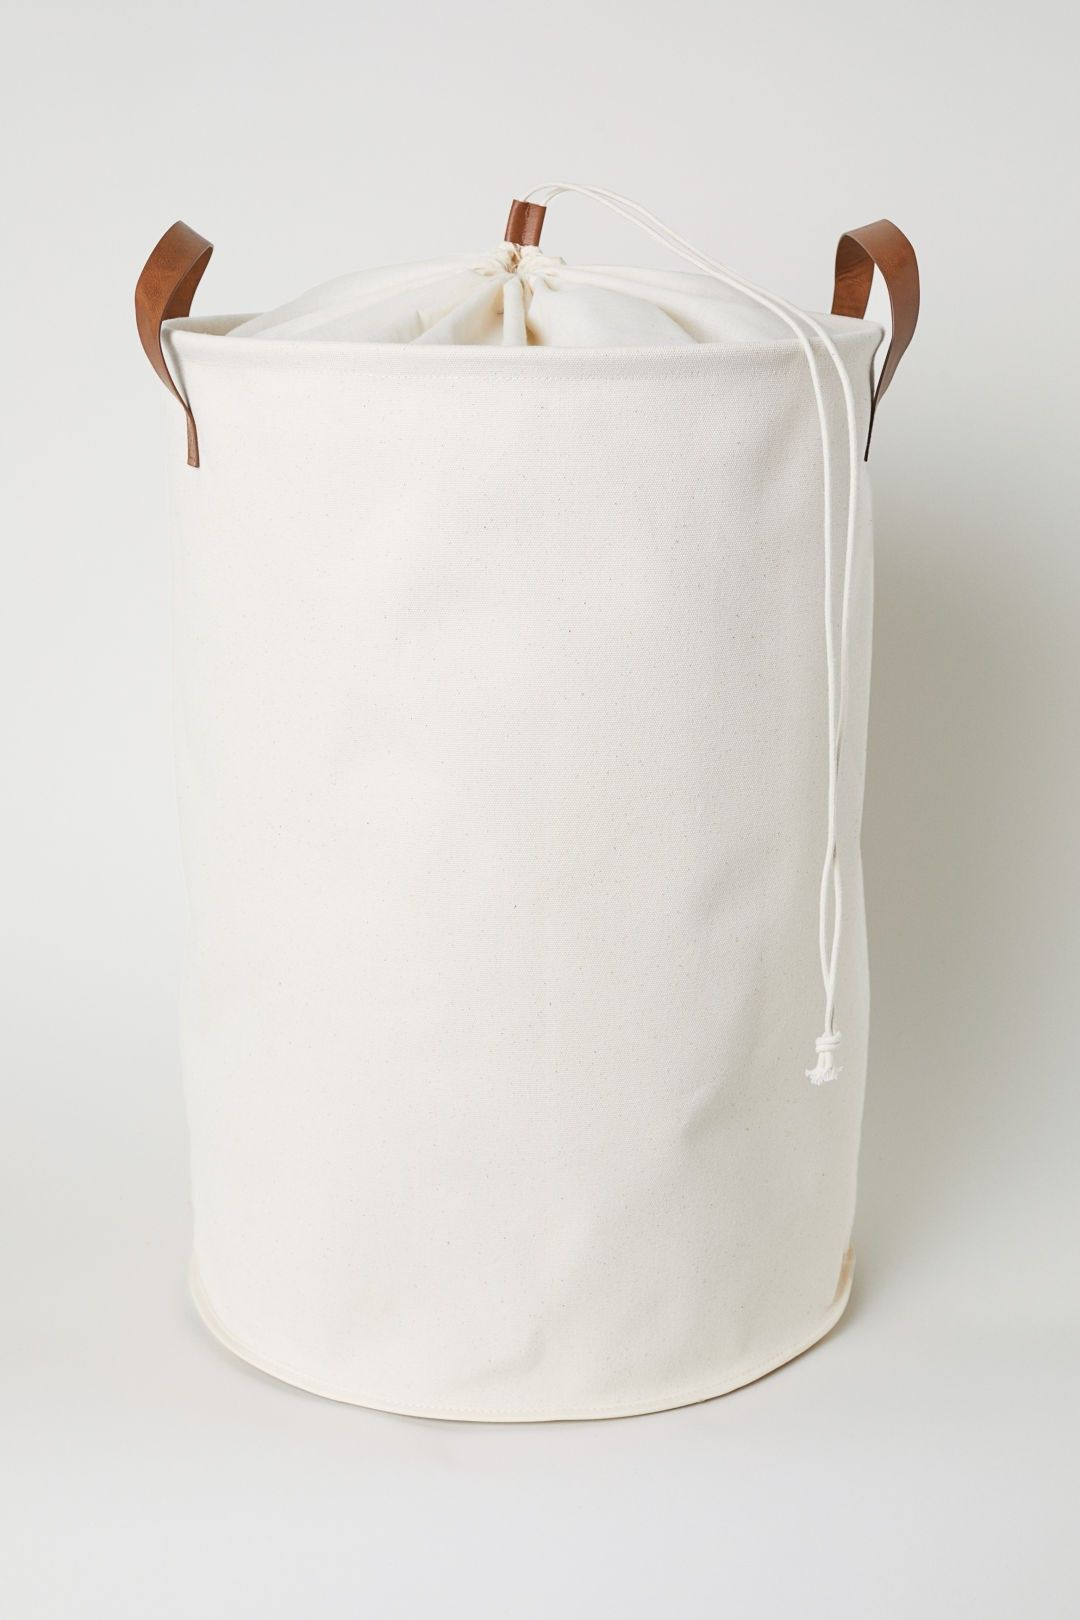 Cotton Twill Laundry Bag Laundry Bag Baby Staples White Bag